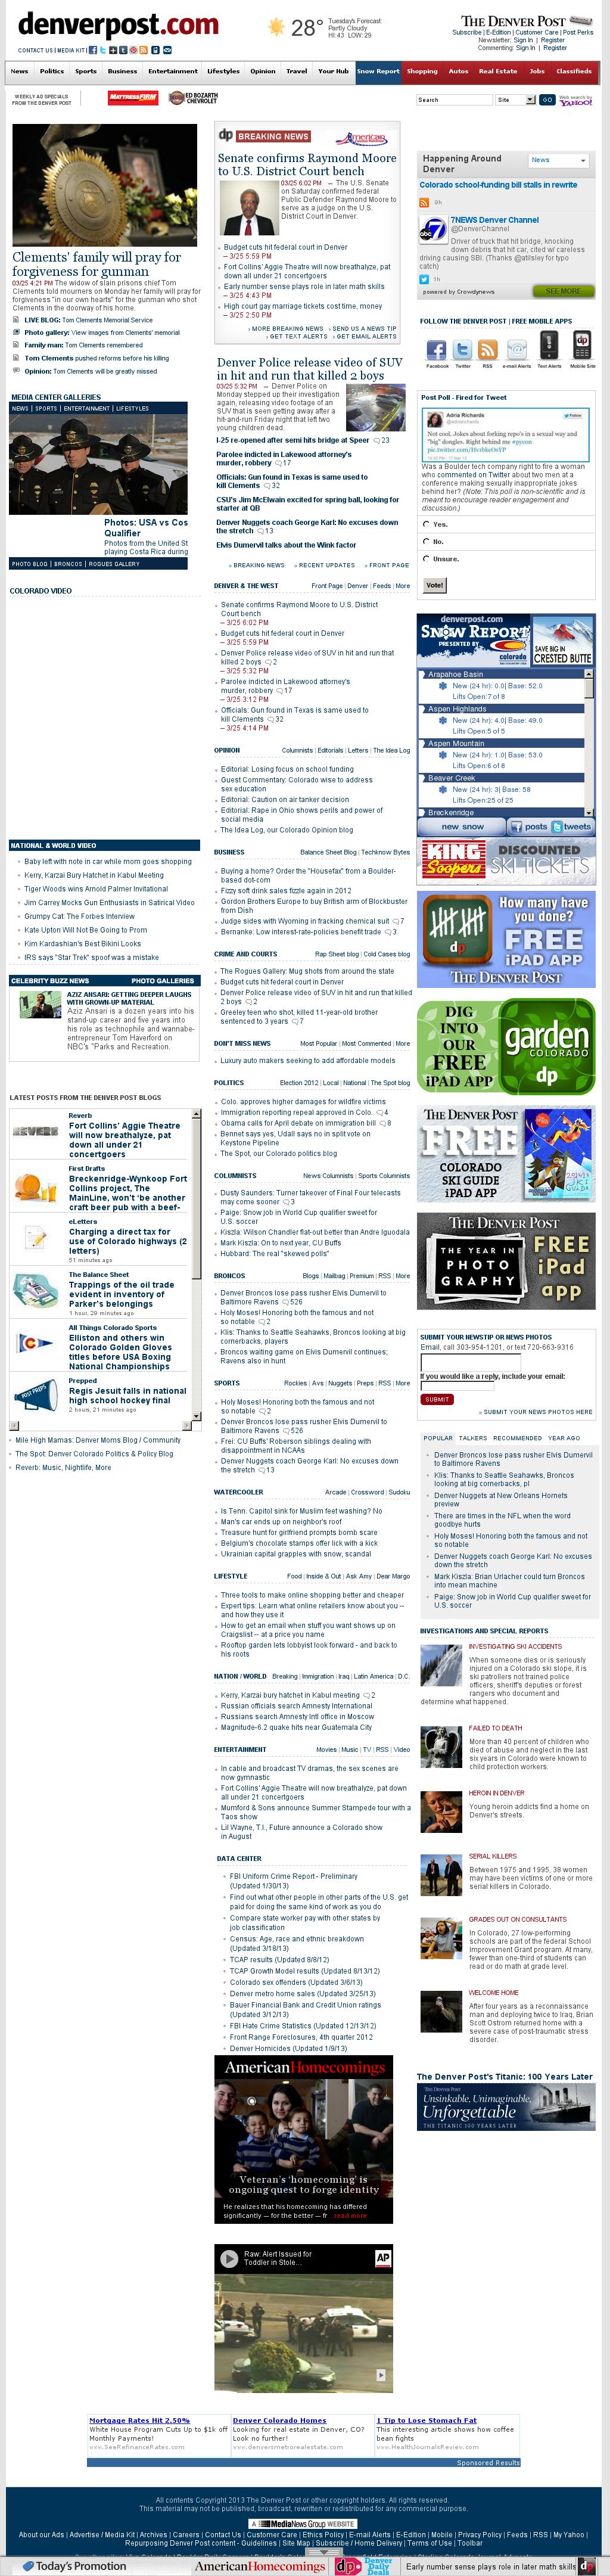 Denver Post at Tuesday March 26, 2013, 12:09 a.m. UTC